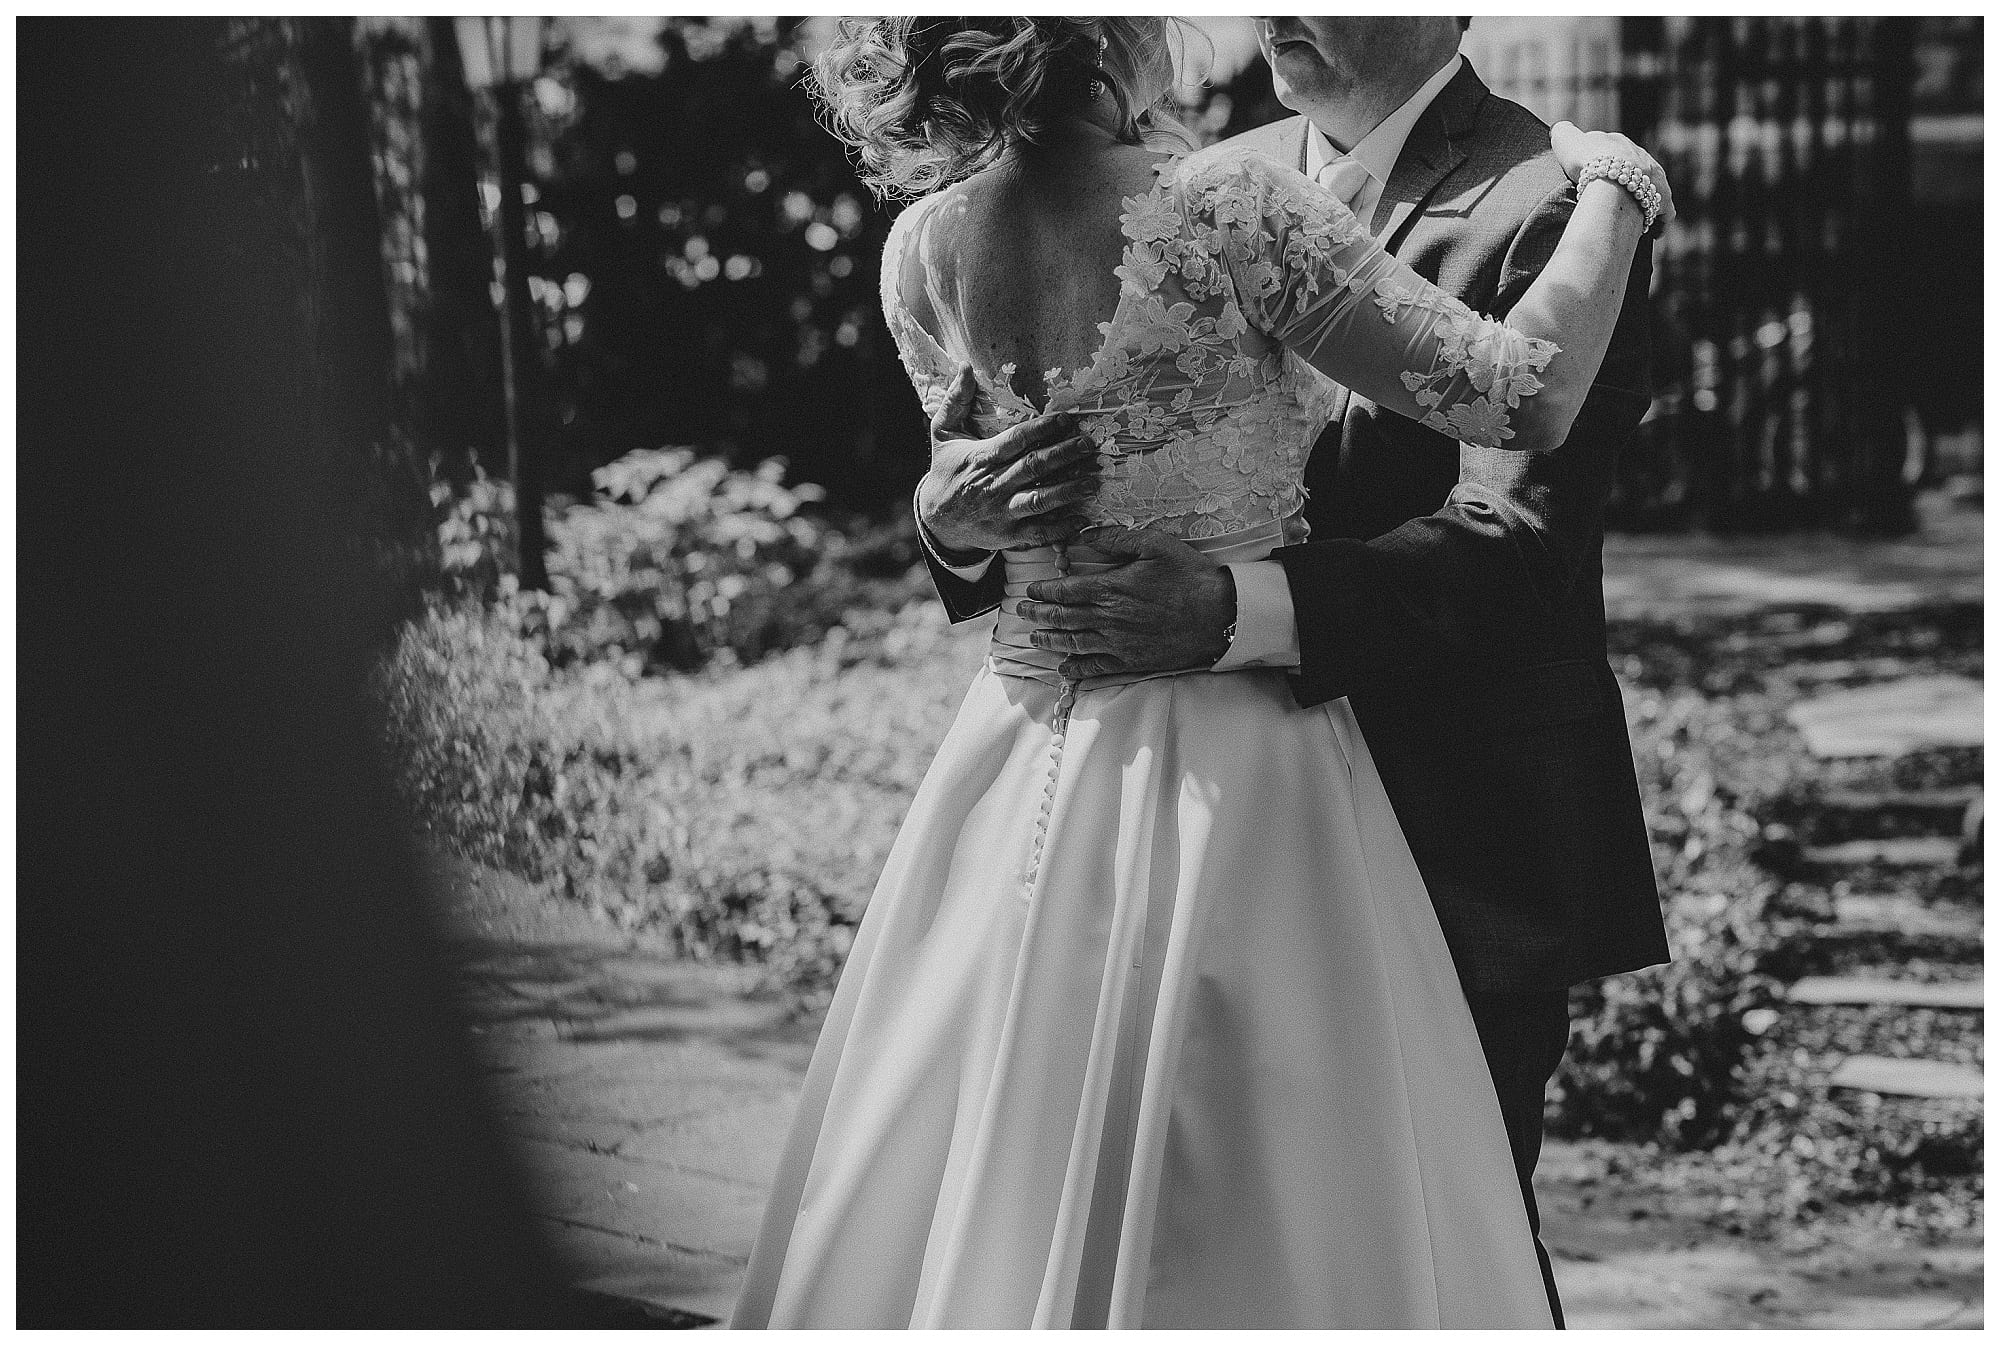 Michigan Wedding Photographers   www.CapturedCouture.com   Captured Couture, LLC